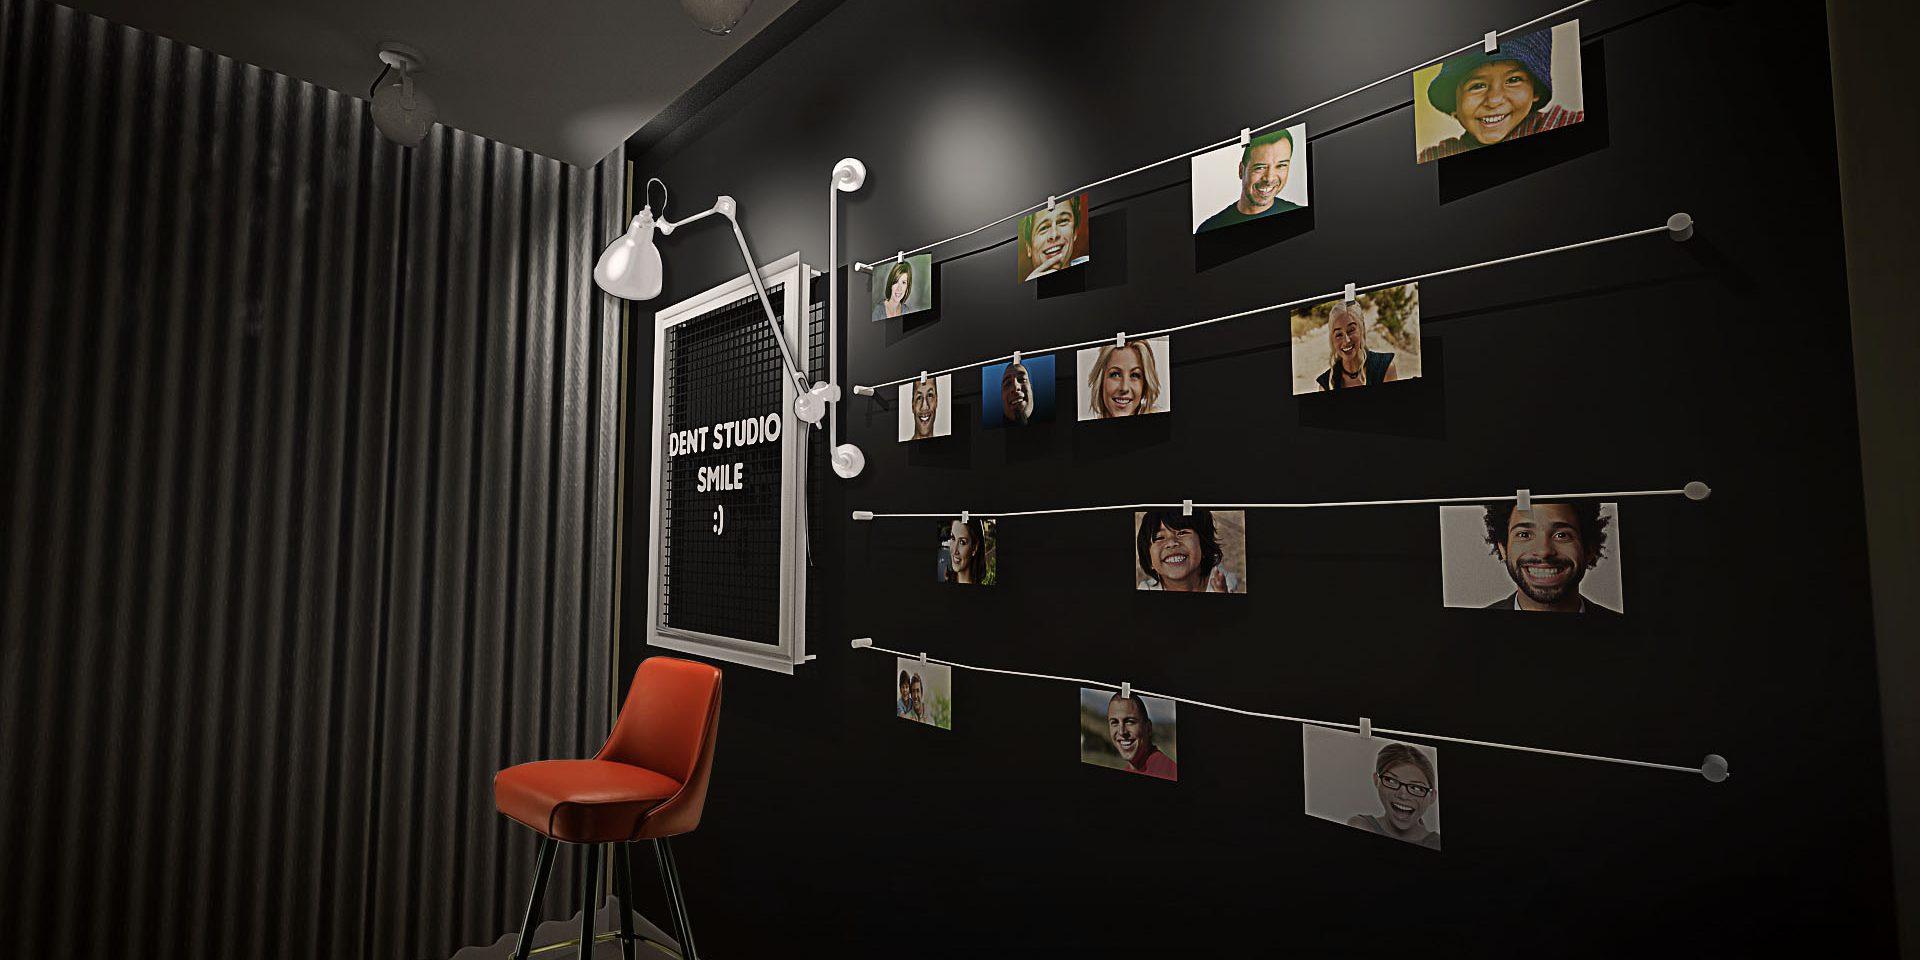 Dent Studio